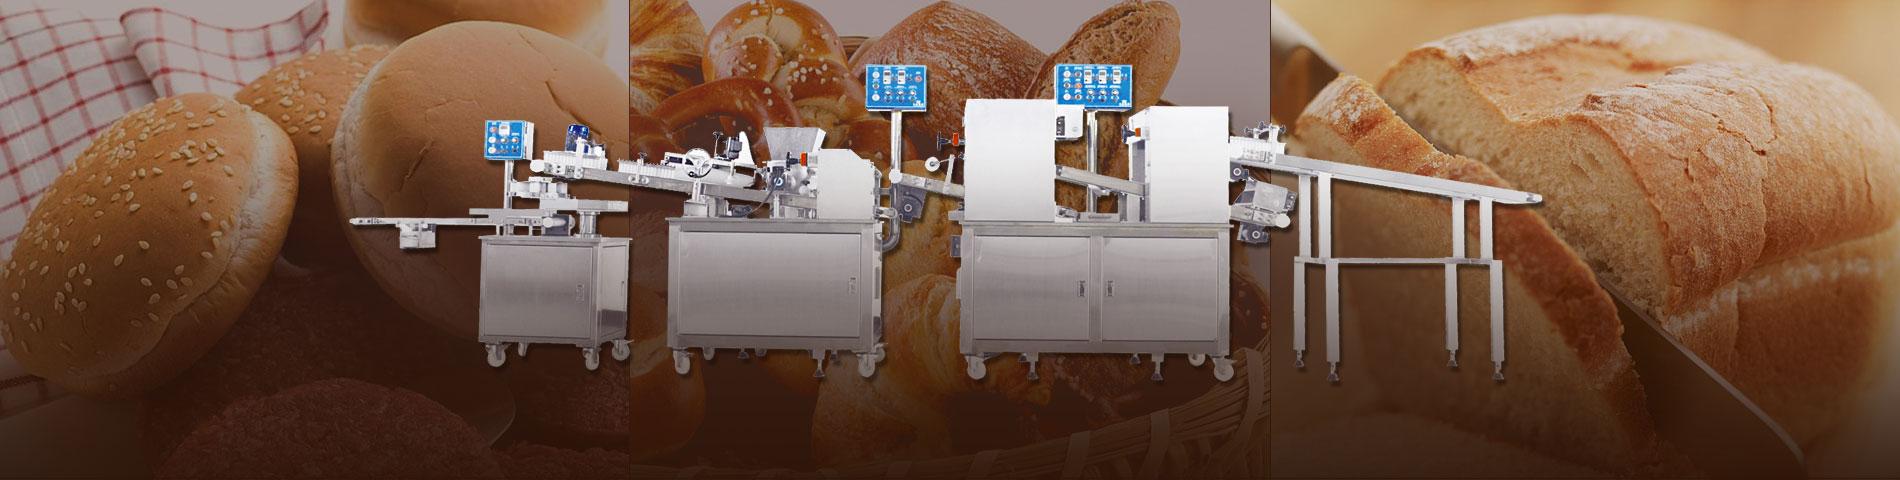 Bread, Toast, Burger Bread TY-8530 bread making machine